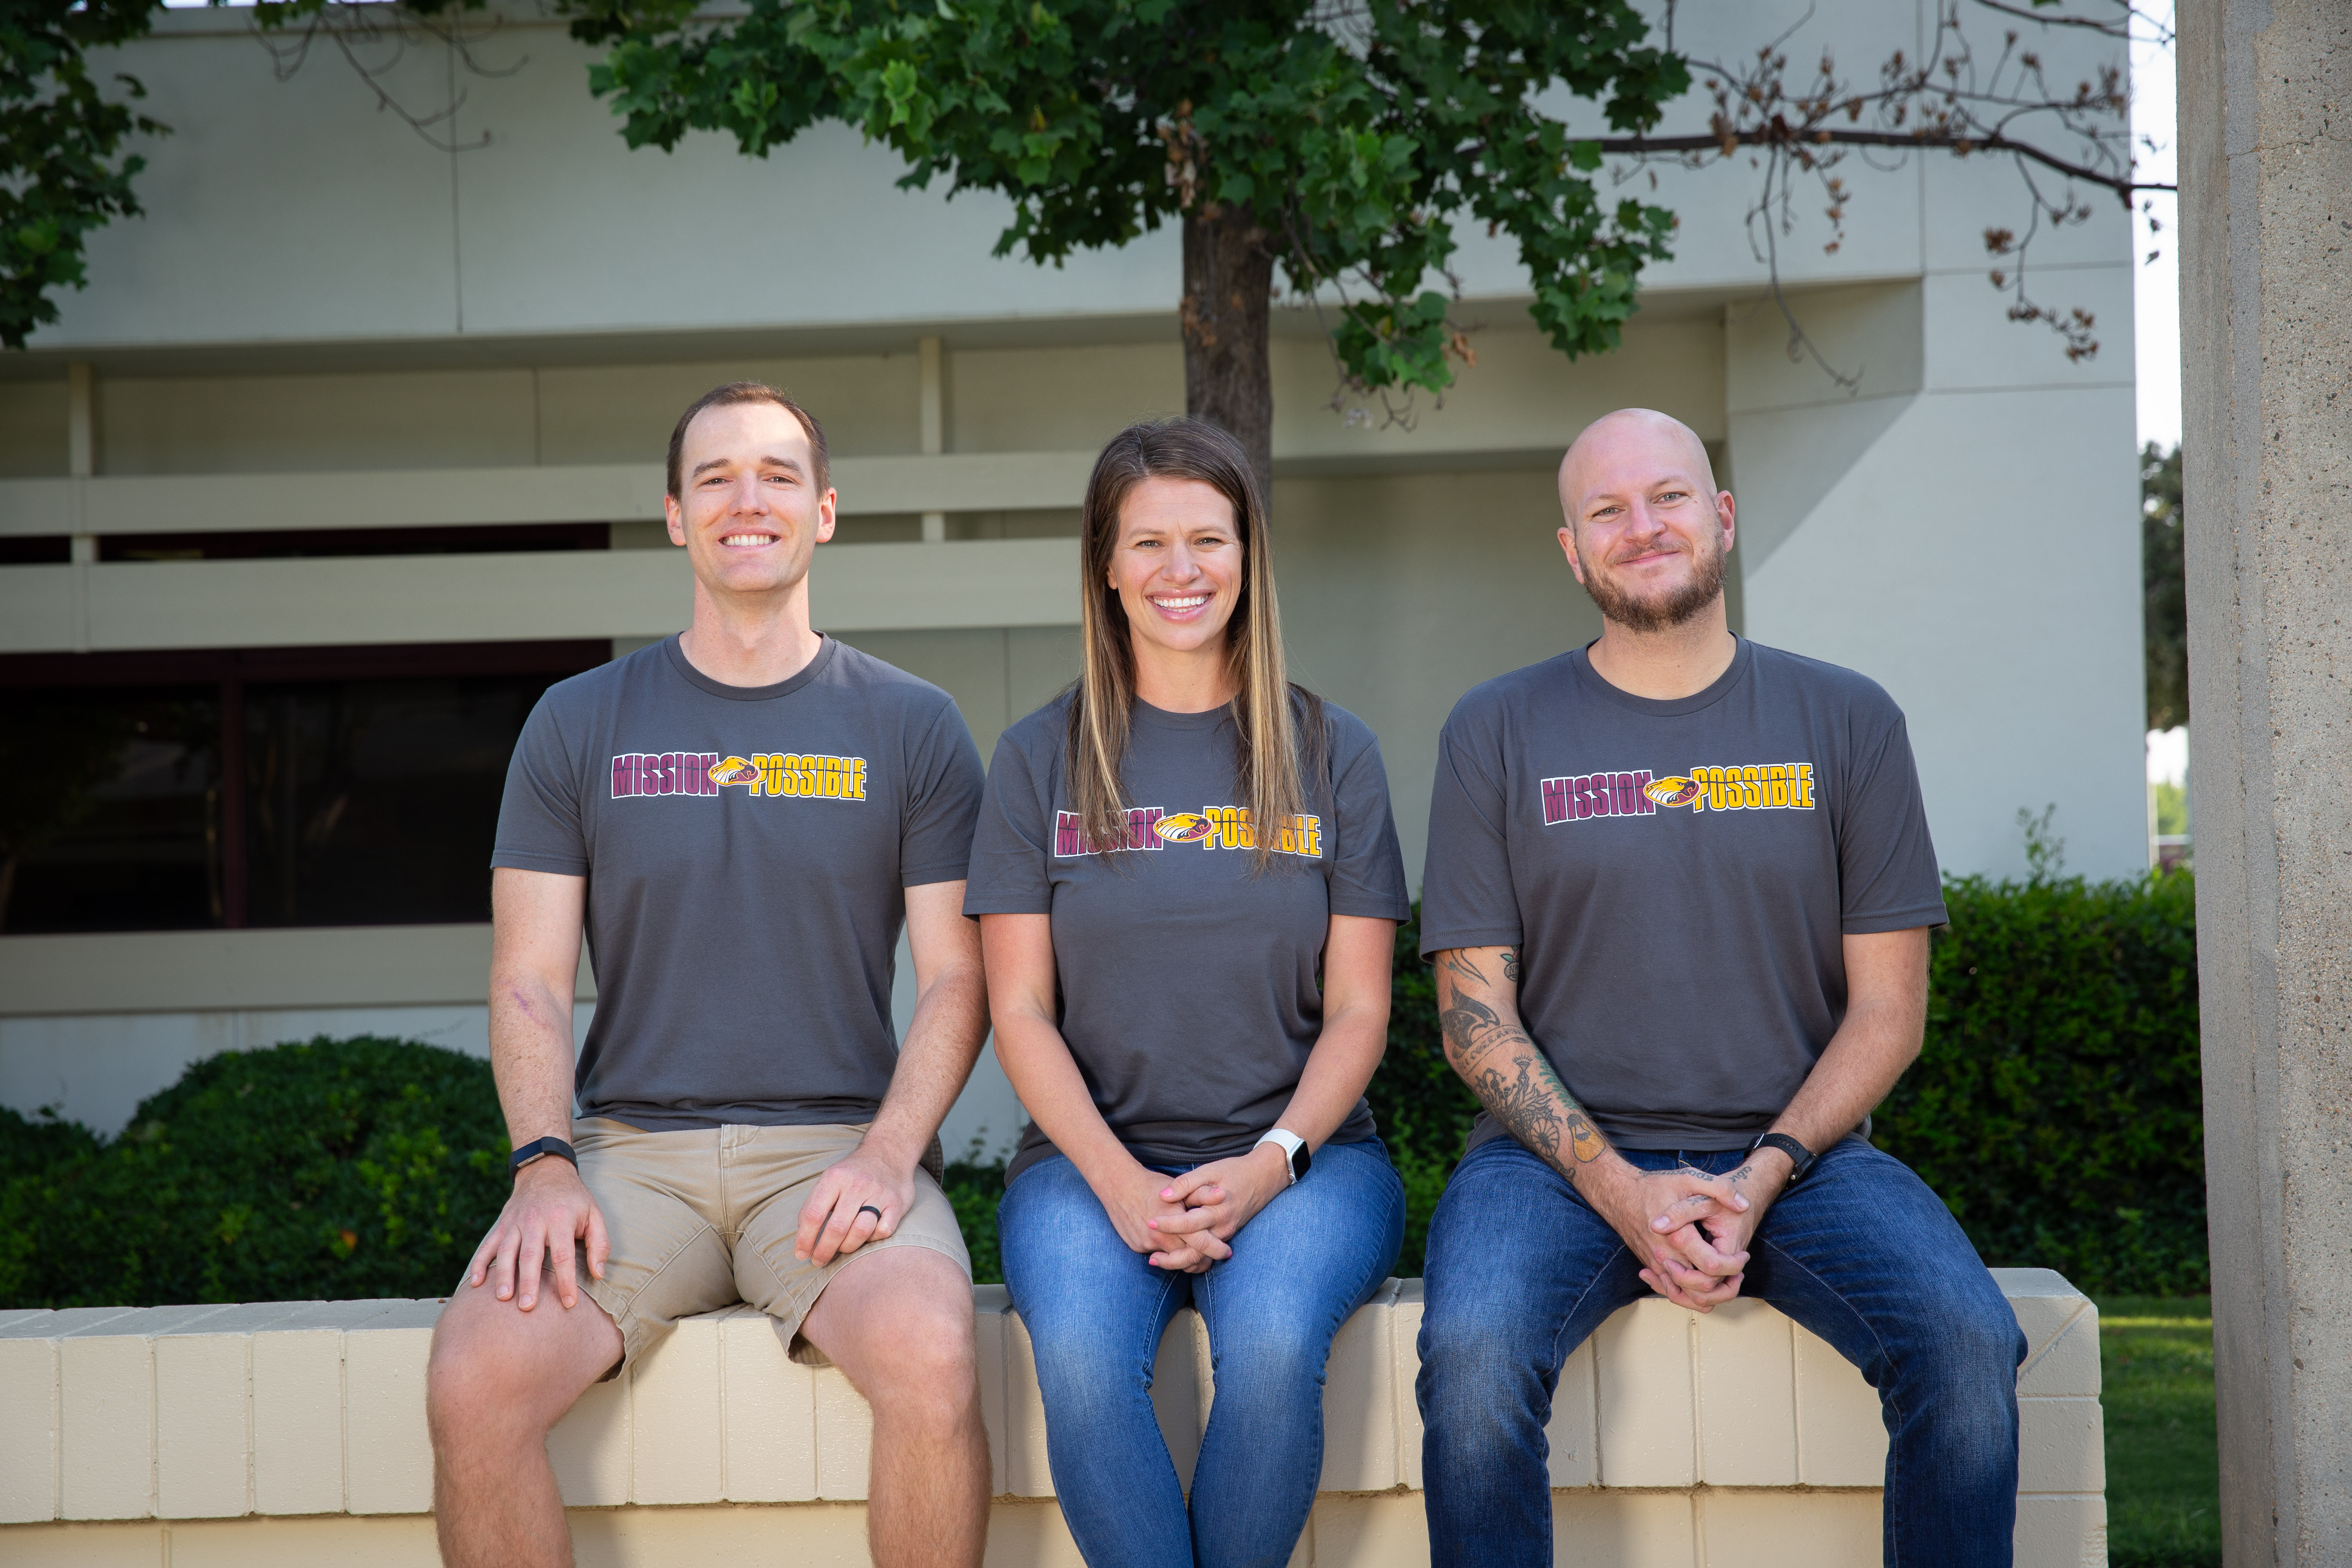 Third grade teachers Micah Haury, Carrie Kiser, and Joel Stetler